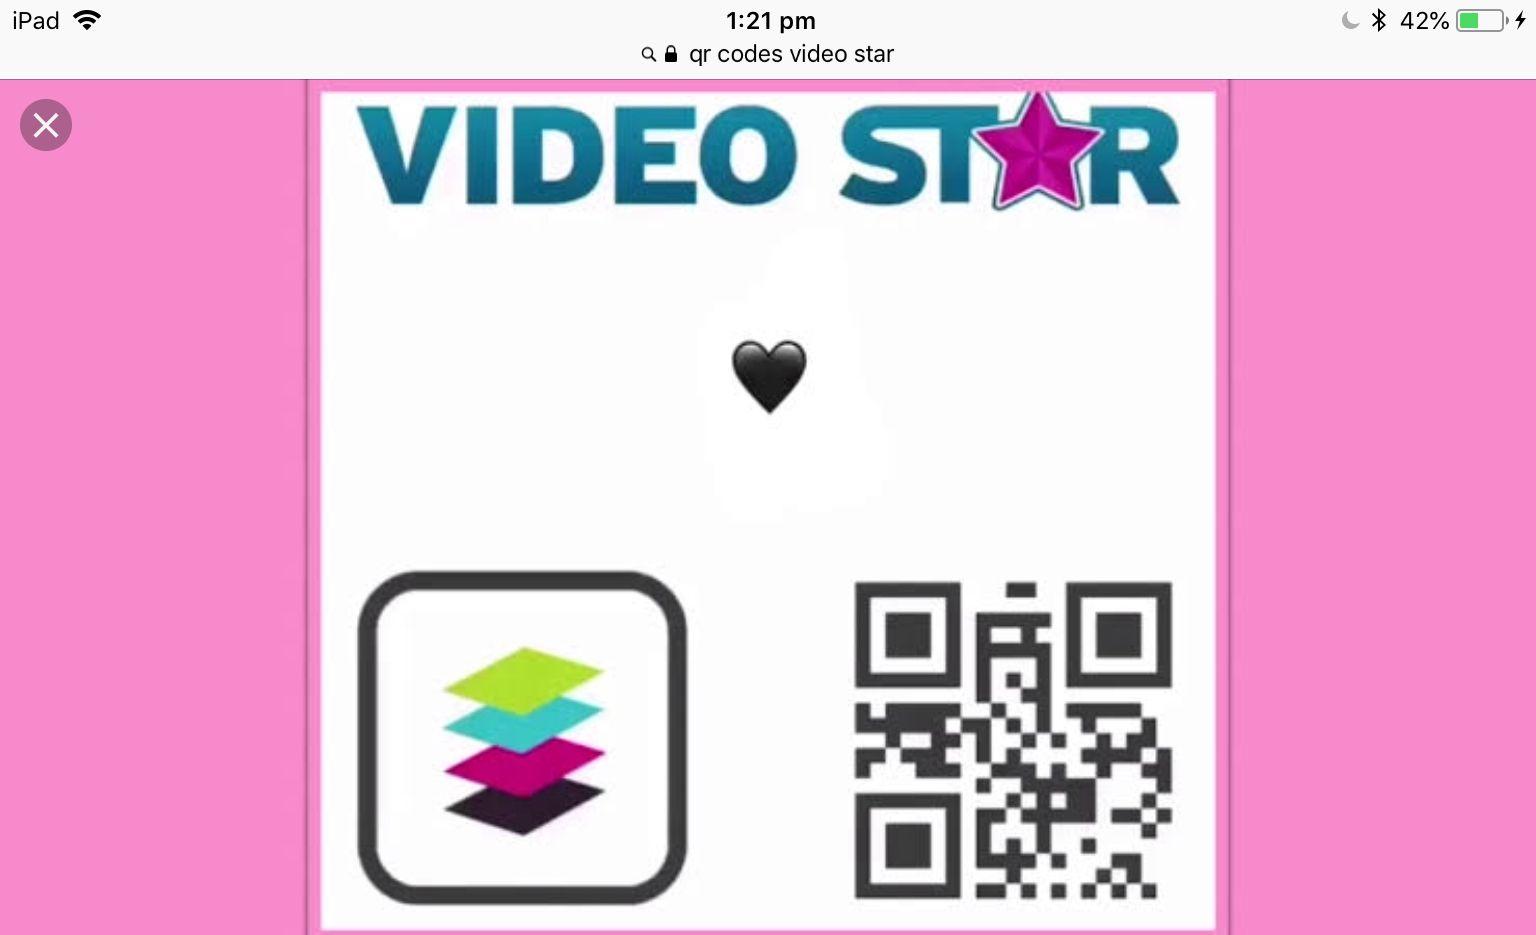 Video Star Emoji Qr Code Coding Instagram Editing Star Emoji